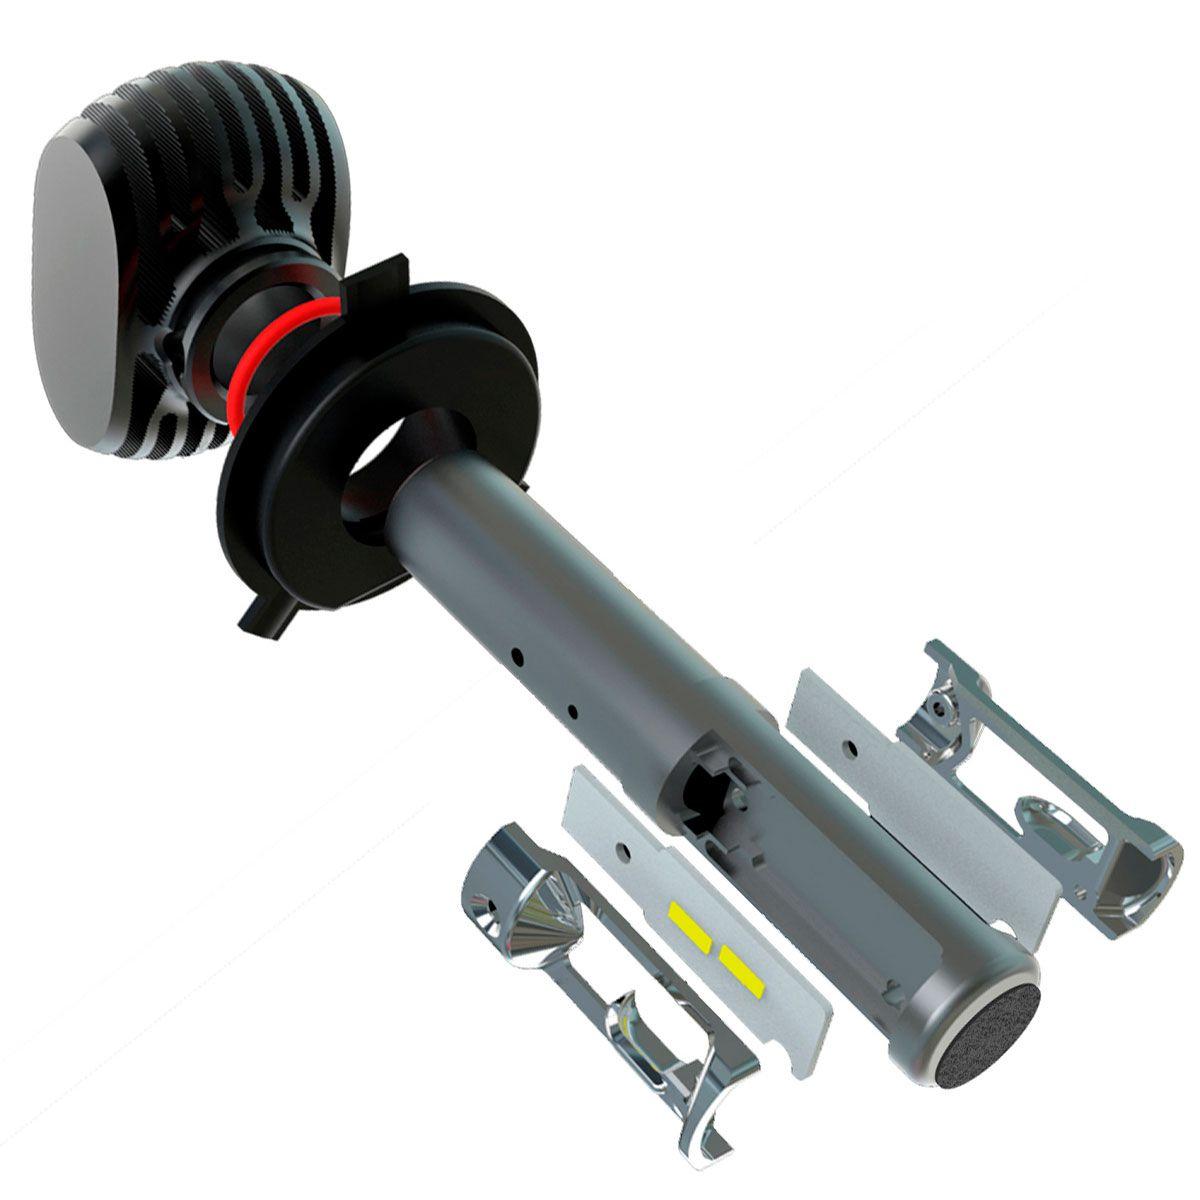 Kit Ultra LED Passat 1993 1994 1995 1996 1997 tipo xenon farol baixo H1 50W